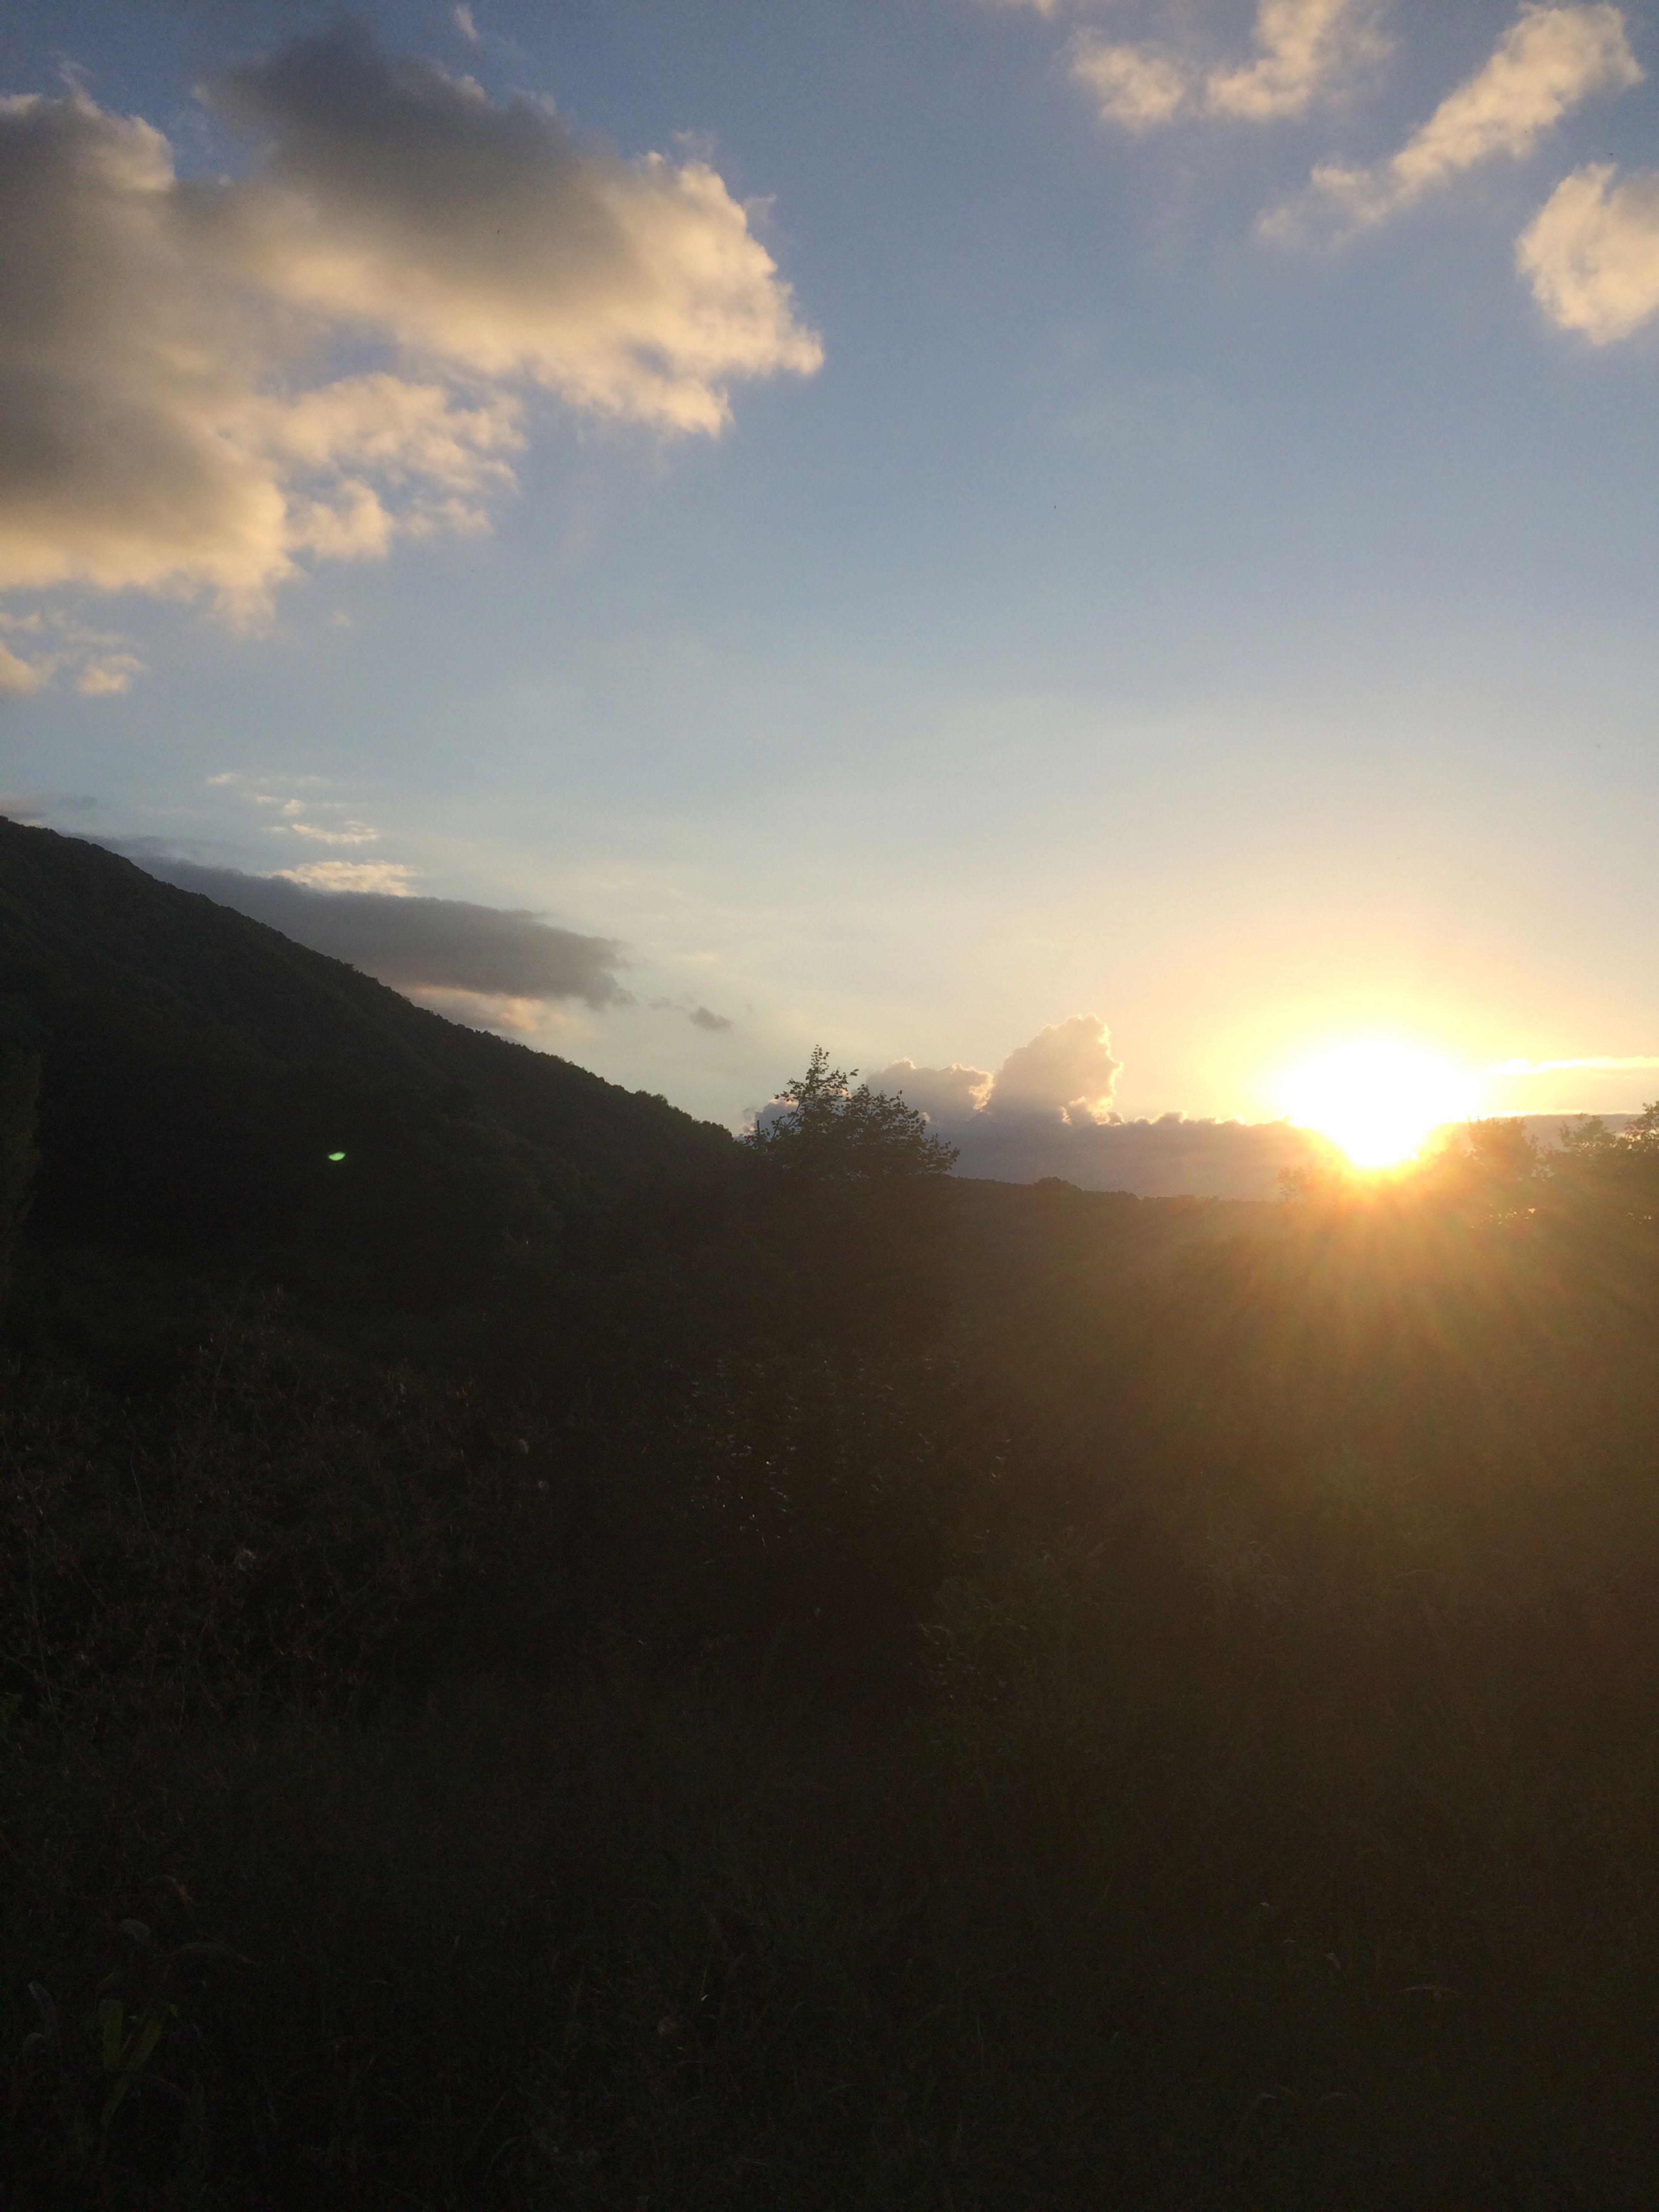 Sunlight Beauty In Nature Landscape Cloud